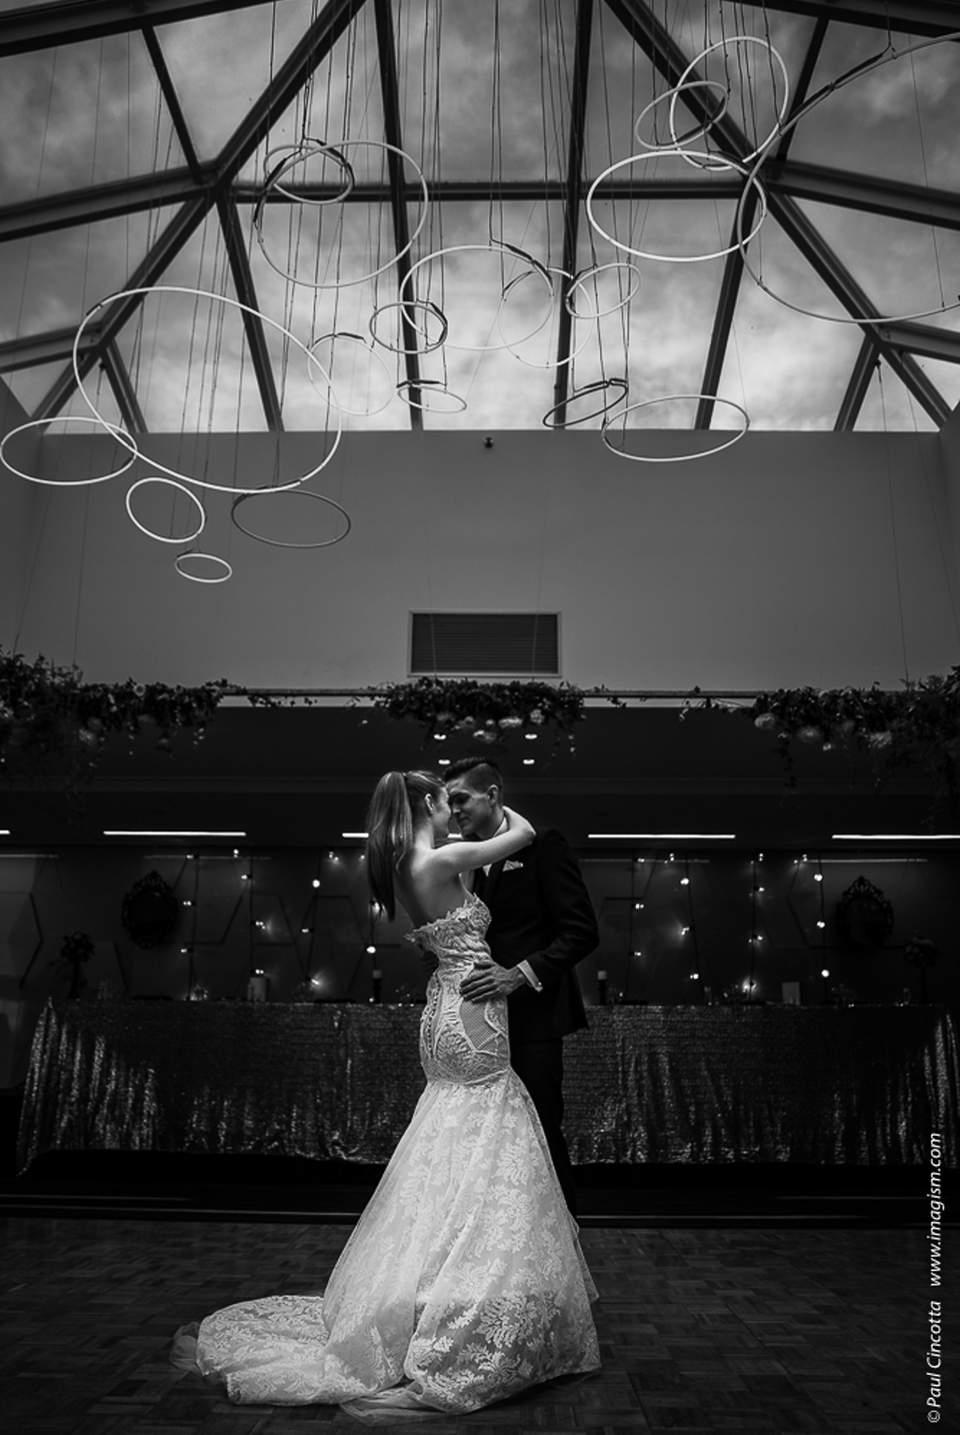 RACV Royal Pines Gold Coast Wedding Photography by paul Cincotta www.imagism.com 20.jpg